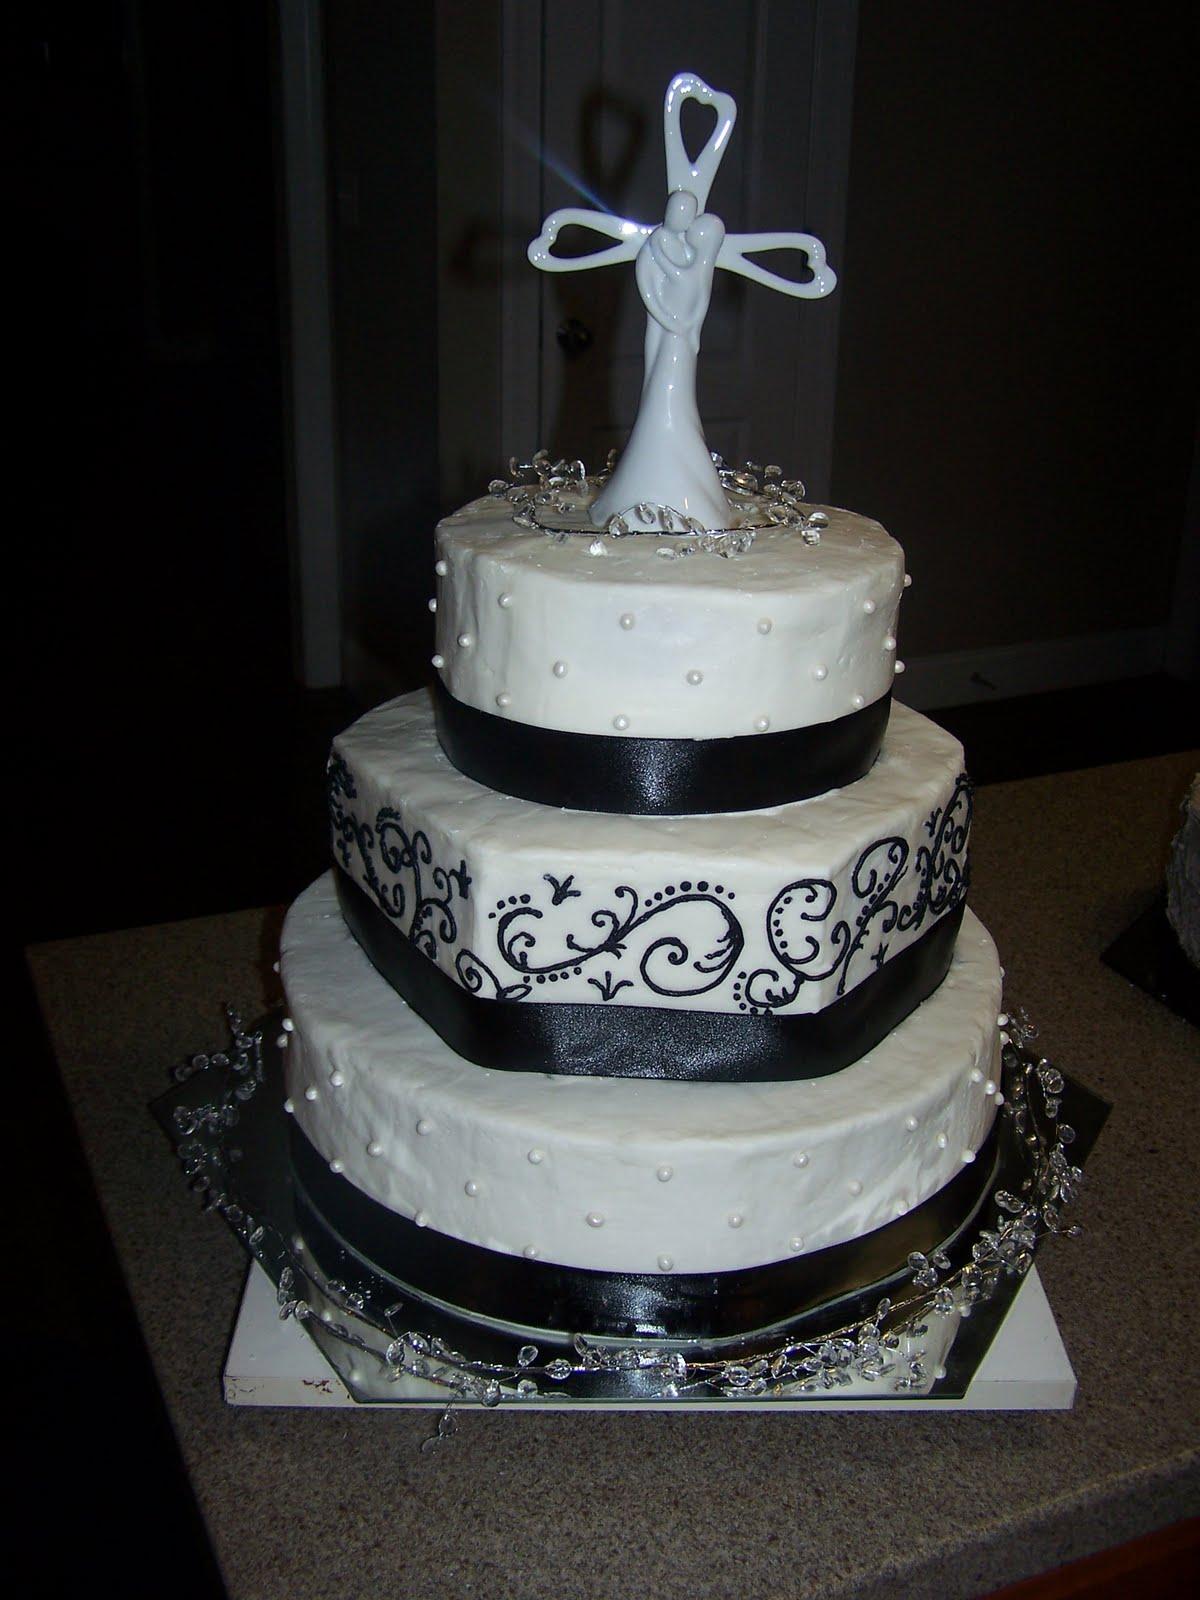 Creative Cakes N More Black And White Elegance Wedding Cake